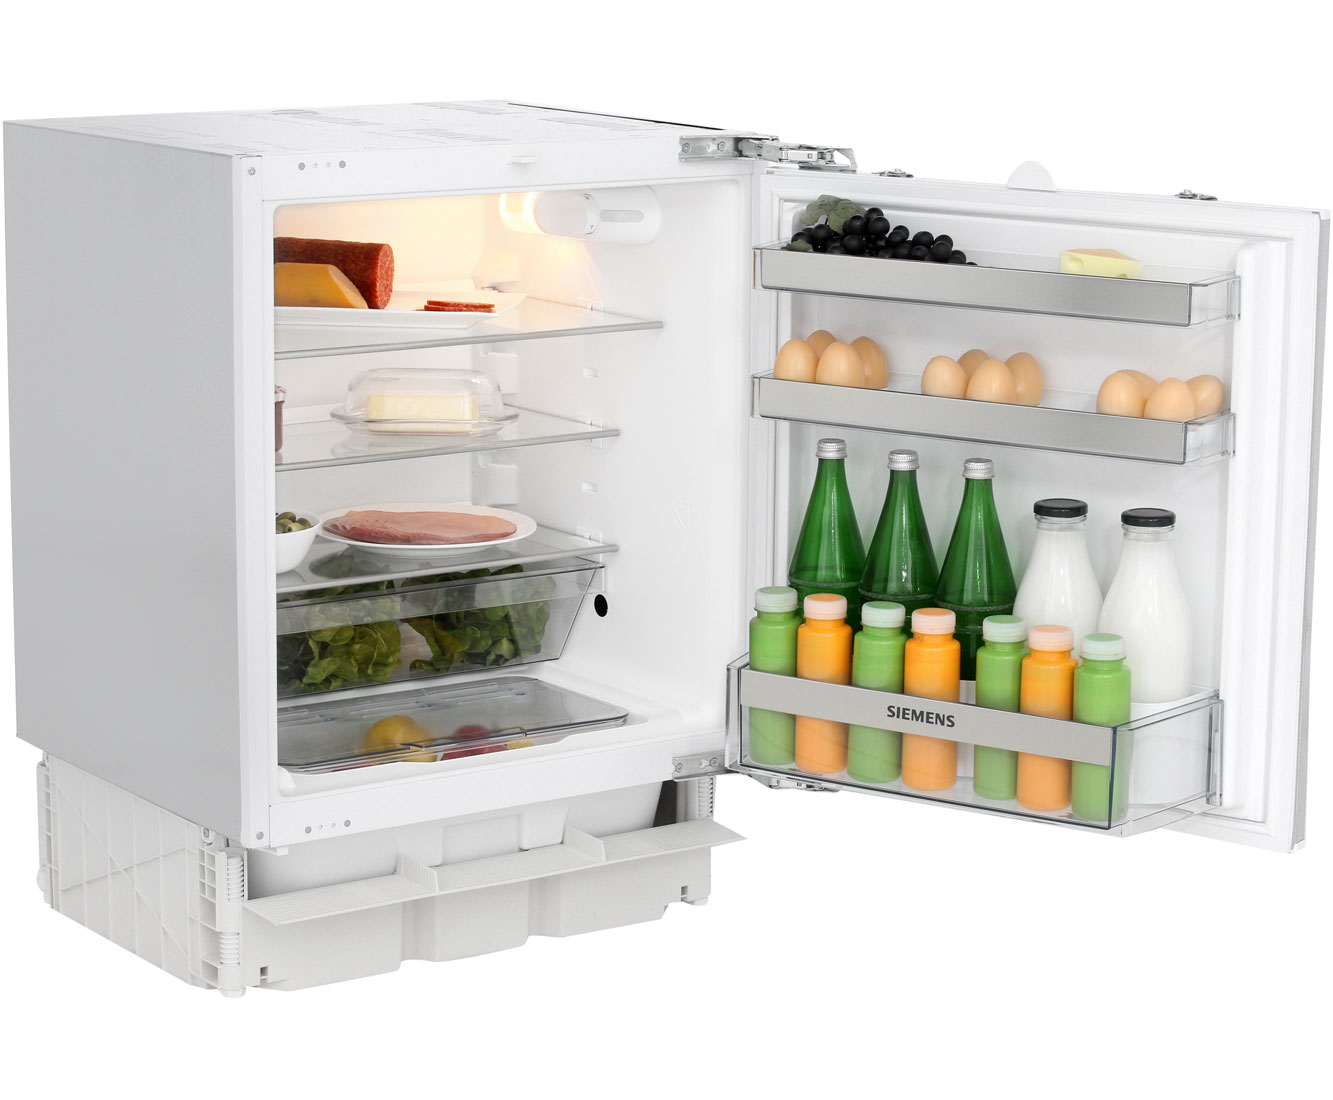 Kühlschrank Siemens : Siemens iq ku ra unterbau kühlschrank er nische festtür